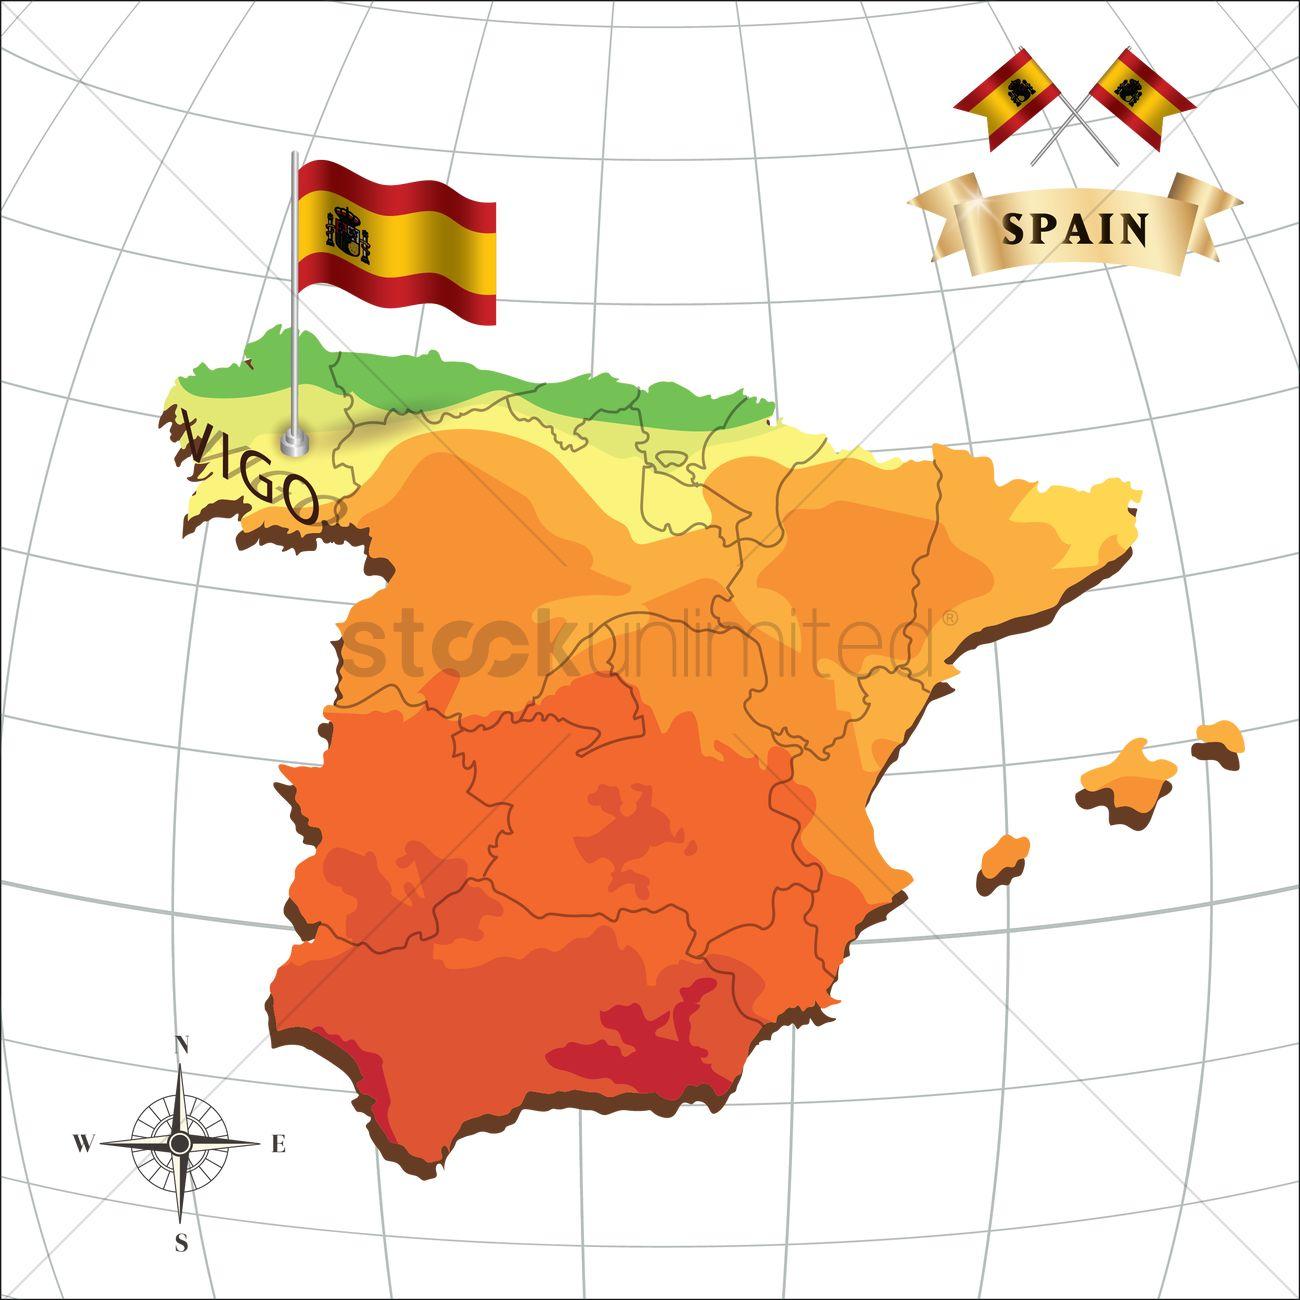 Map Of Spain Vigo.Map Of Spain With Vigo Vector Image 1597925 Stockunlimited